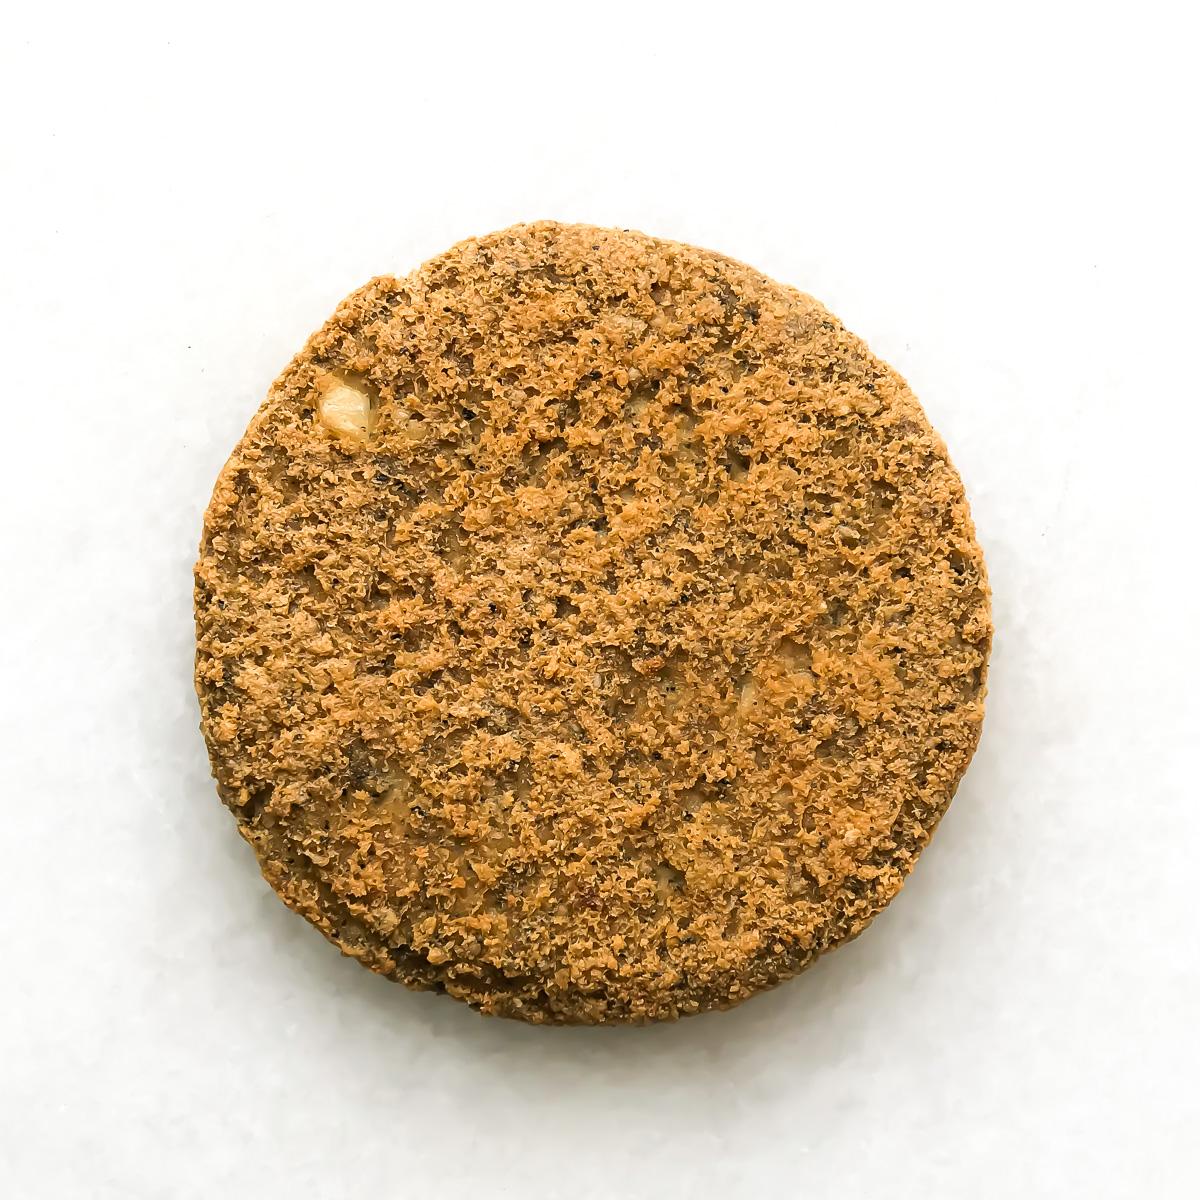 Trader Joe's Protein Burger